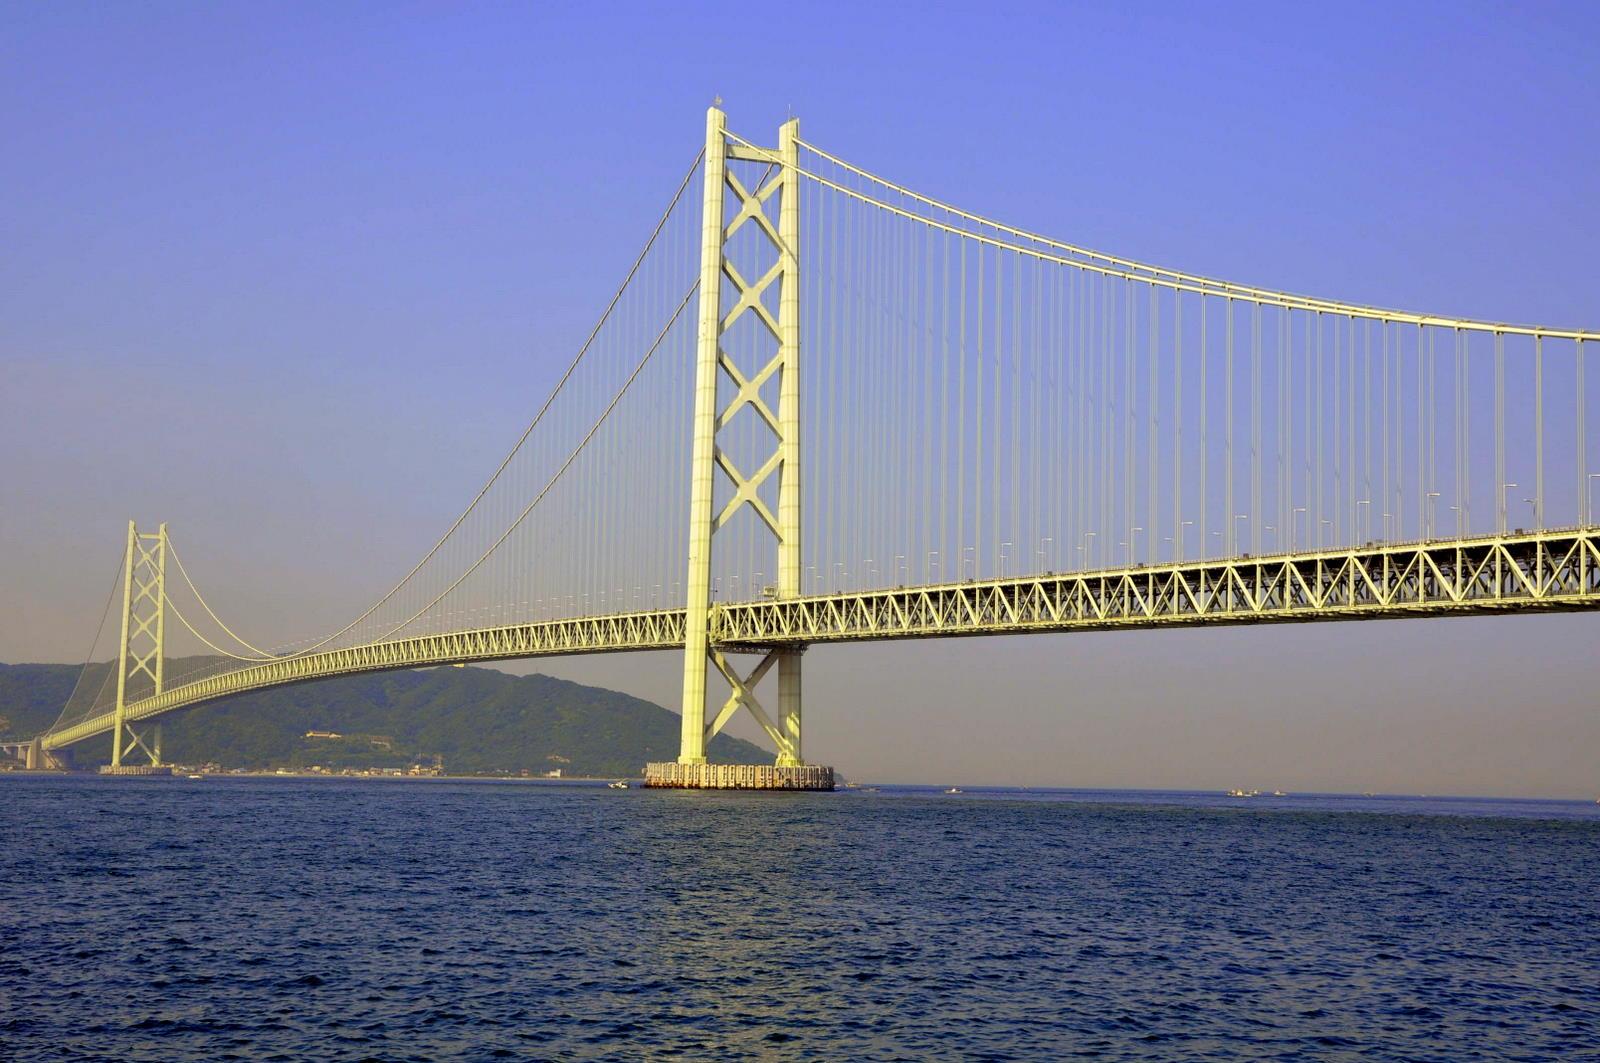 Akashi Kaikyo Bridge, Akashi Strait, Japan - Verdict Traffic Akashi kaikyo bridge images